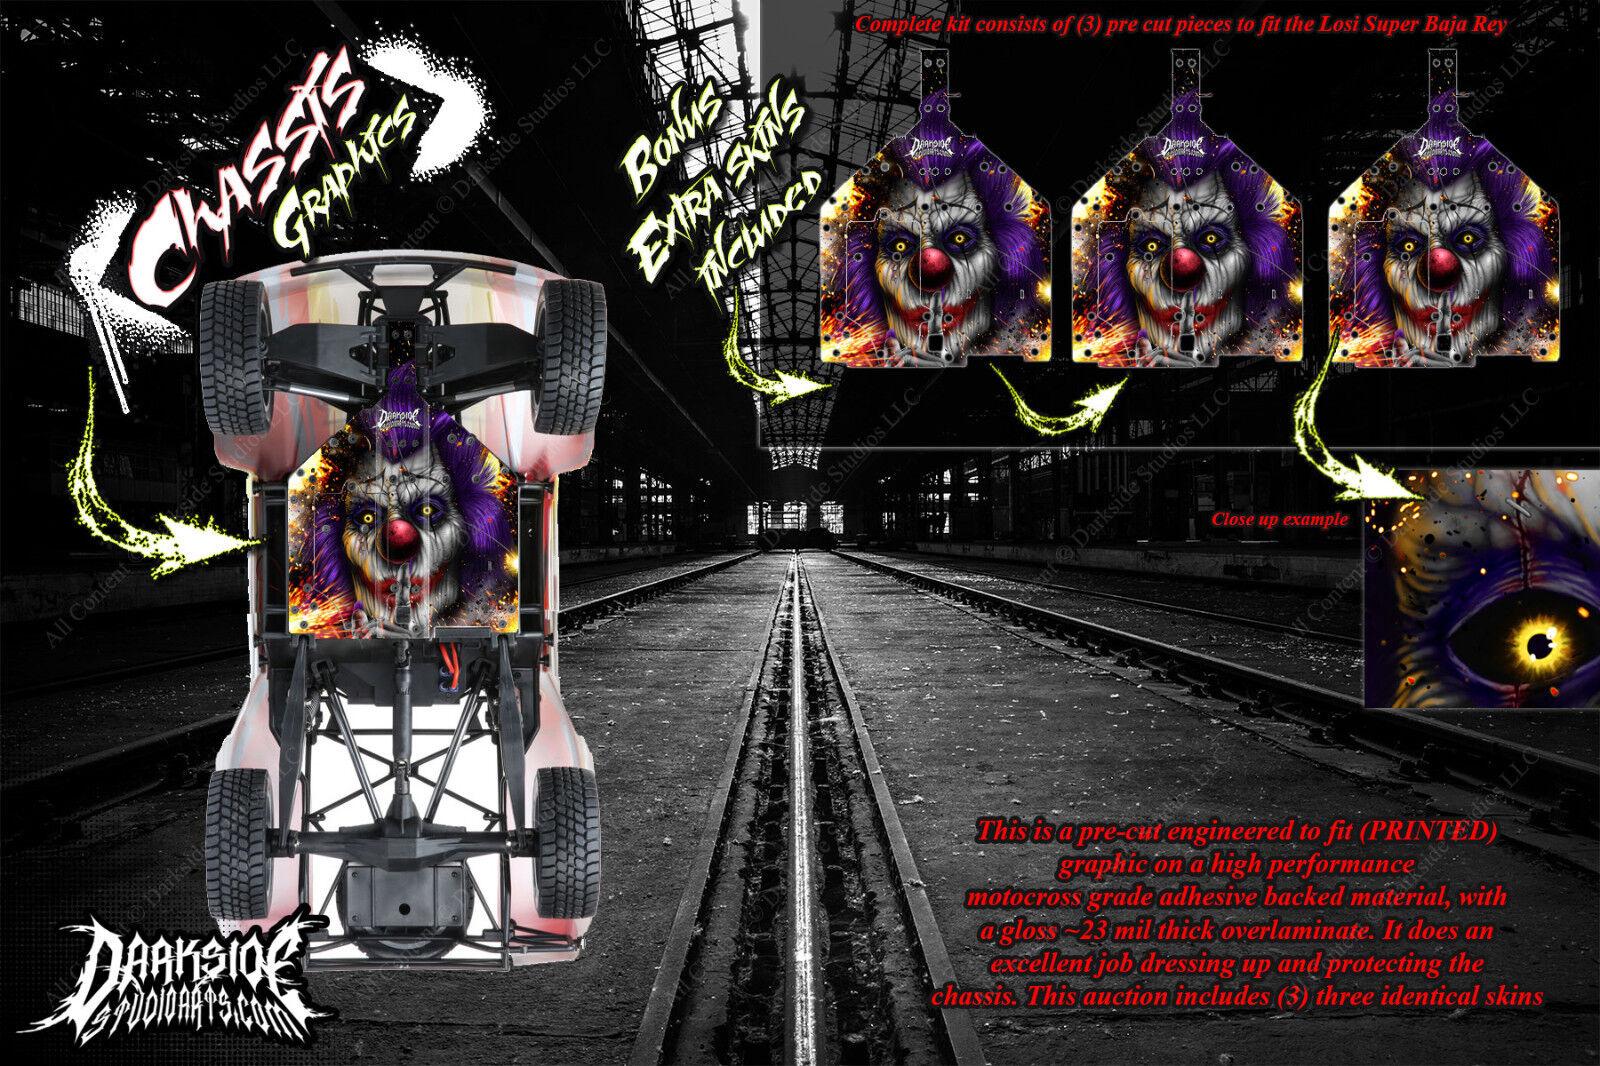 Losi super baja rey  pyro  chassis wrap decal kit hop bis unterbodenschutzblech schutz